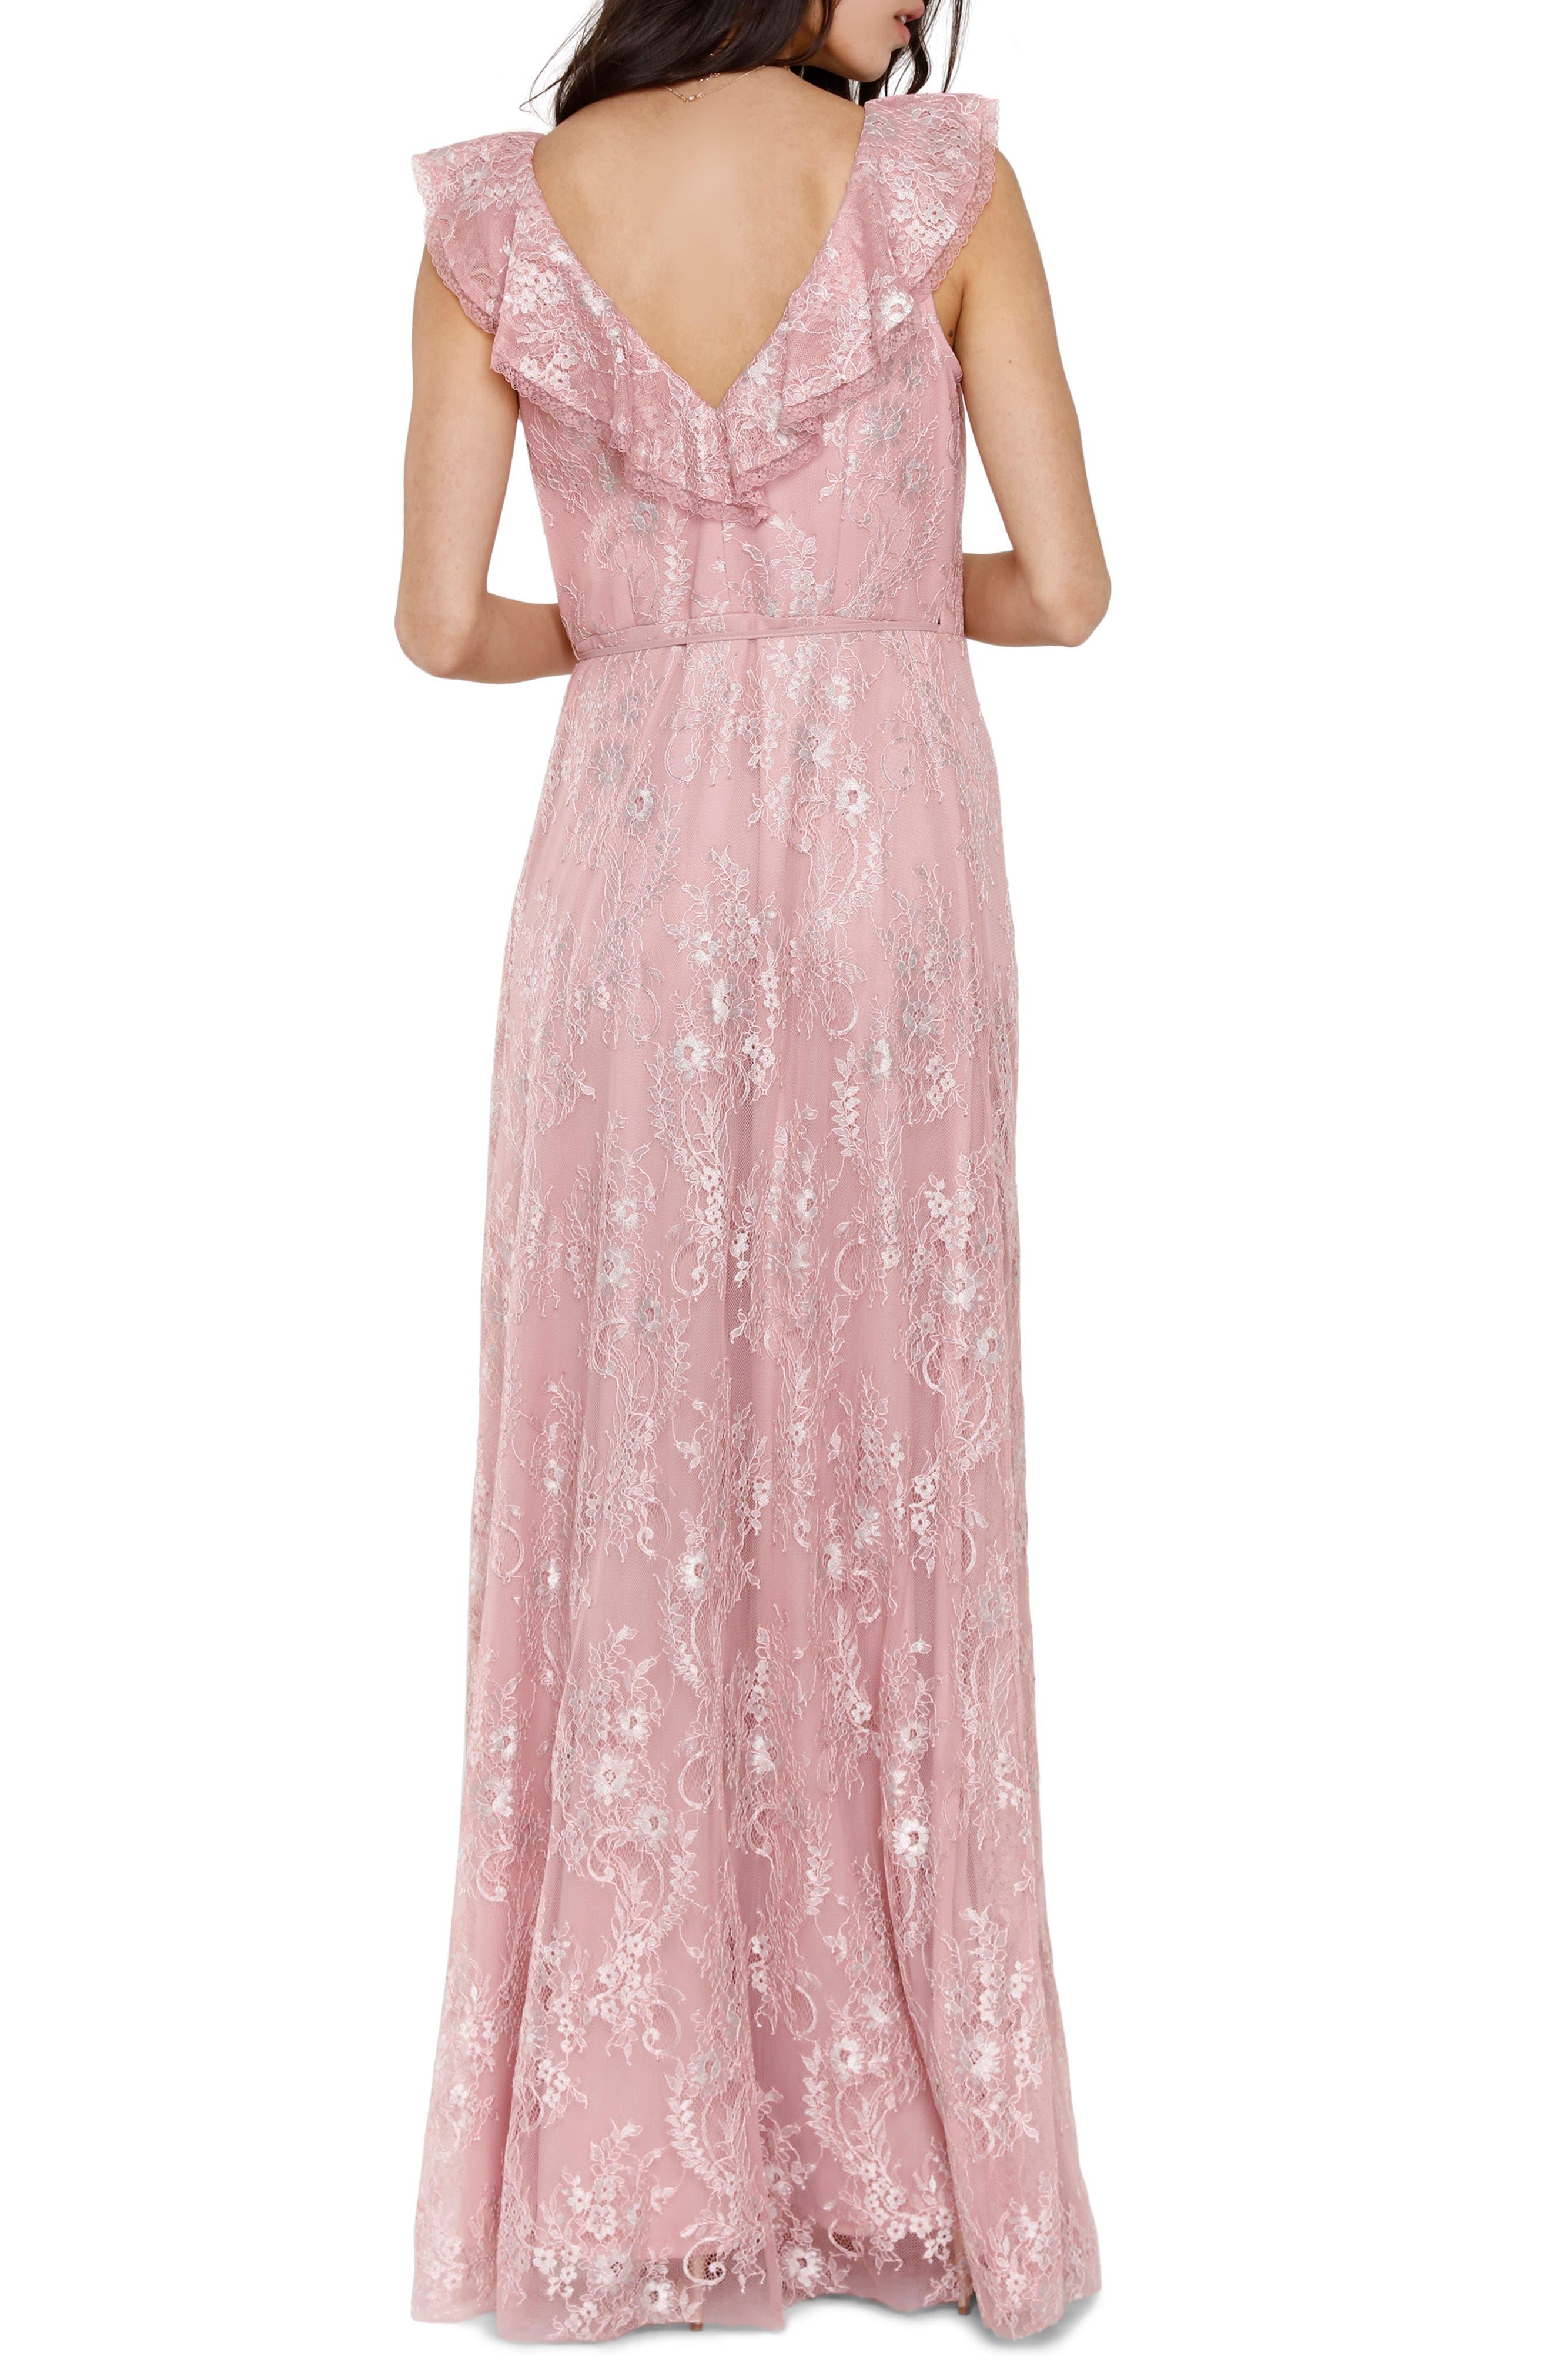 Rio Ruffle Lace Wrap Gown,                             Alternate thumbnail 2, color,                             CALYPSO